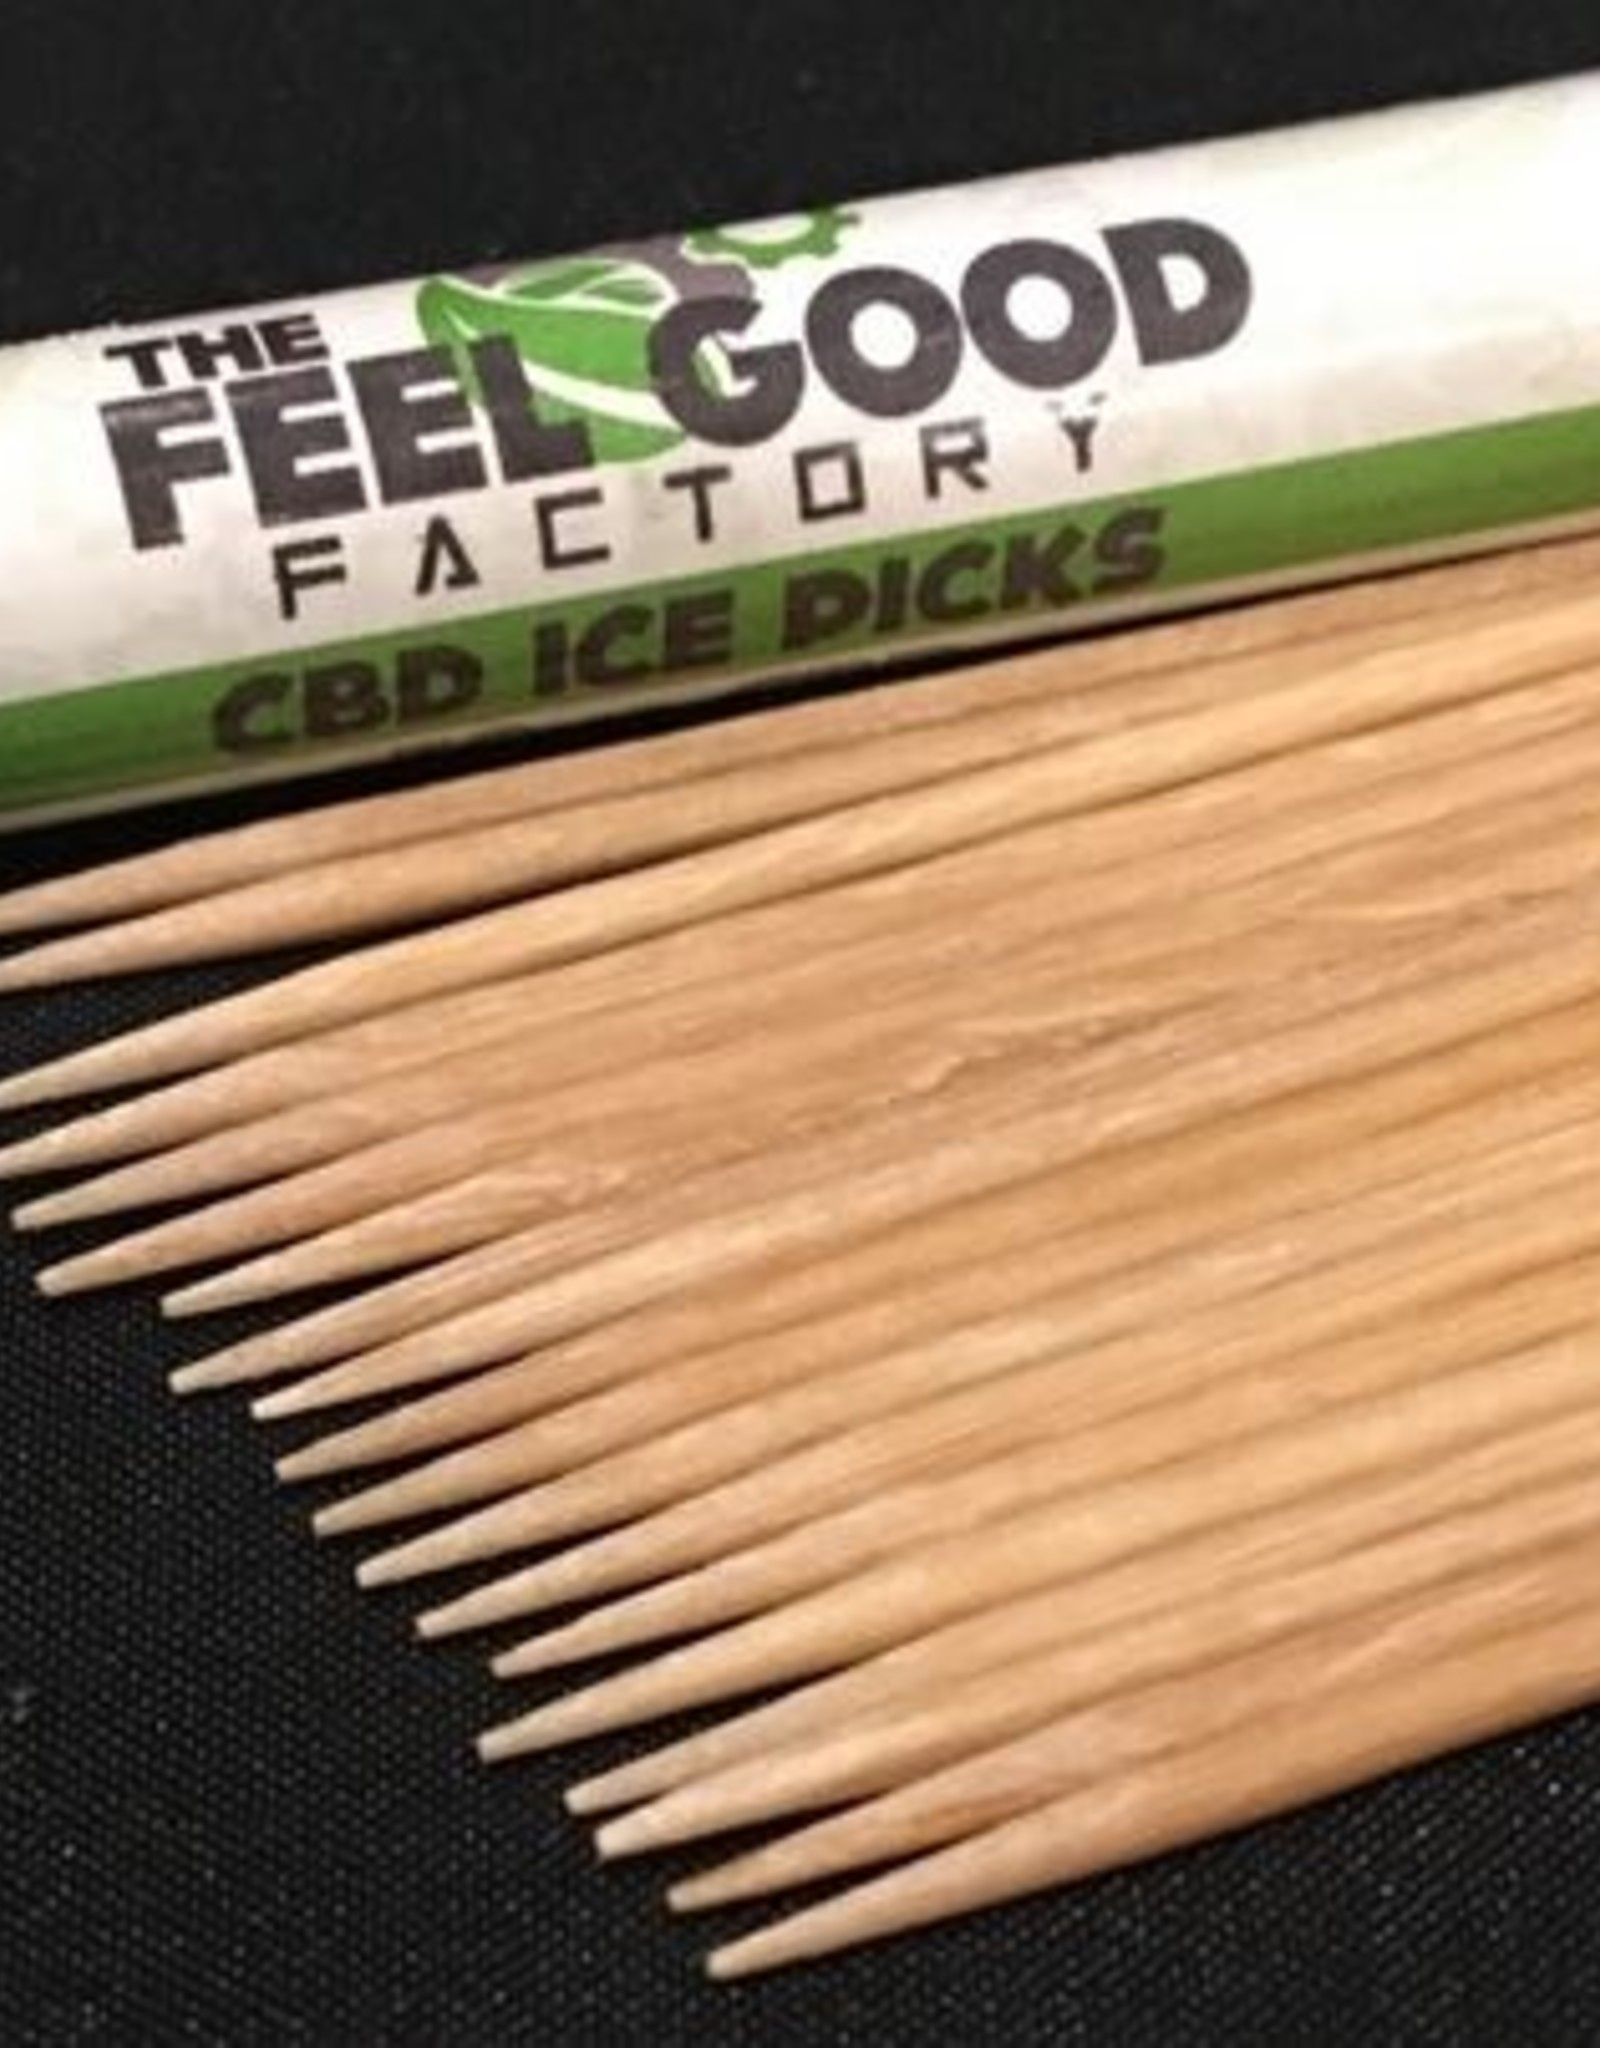 The Feel Good Factory CBD Iced Flavor Tooth Picks 20pcs 50mg/2.5mg each